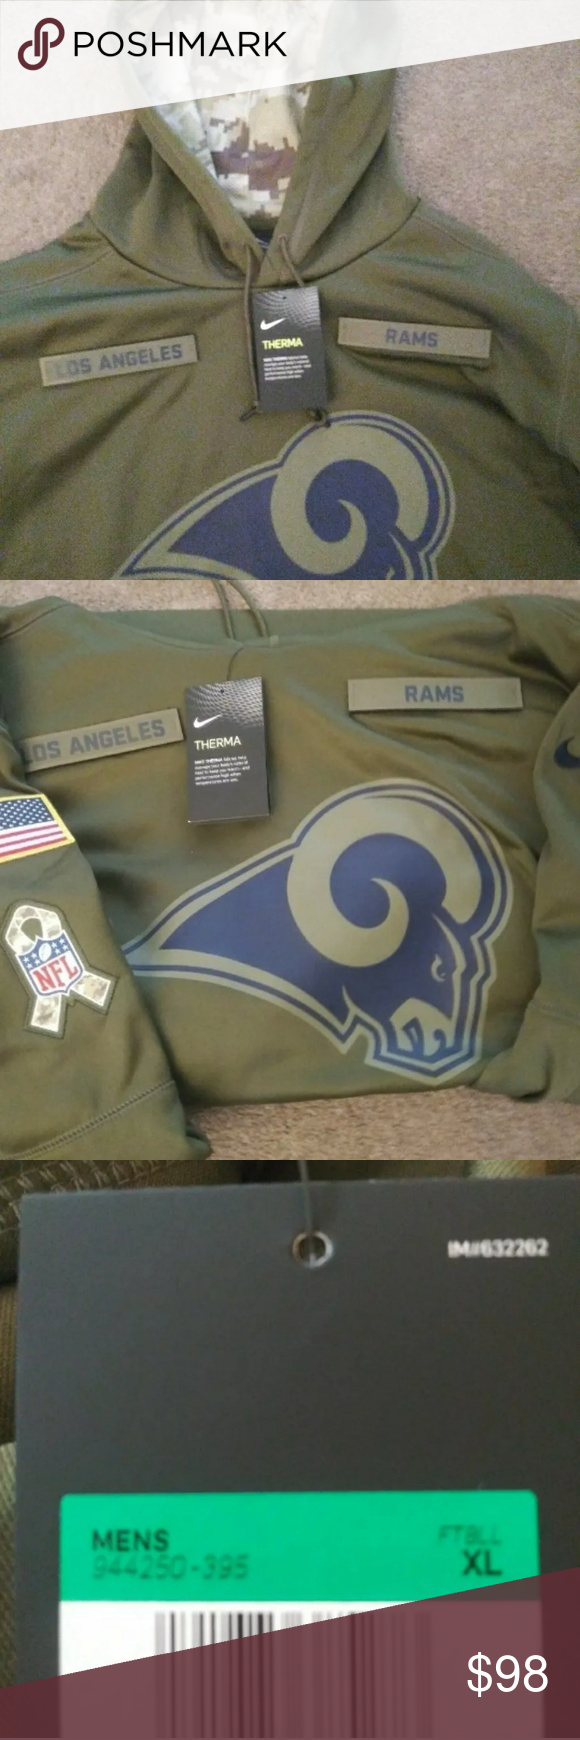 Nike NFL Rams Salute to Service Hoodie Jacket Oliv NFL Rams XL Salute to Service Hoodie NFL Jackets & Coats Lightweight & Shirt Jackets #salutetoservice